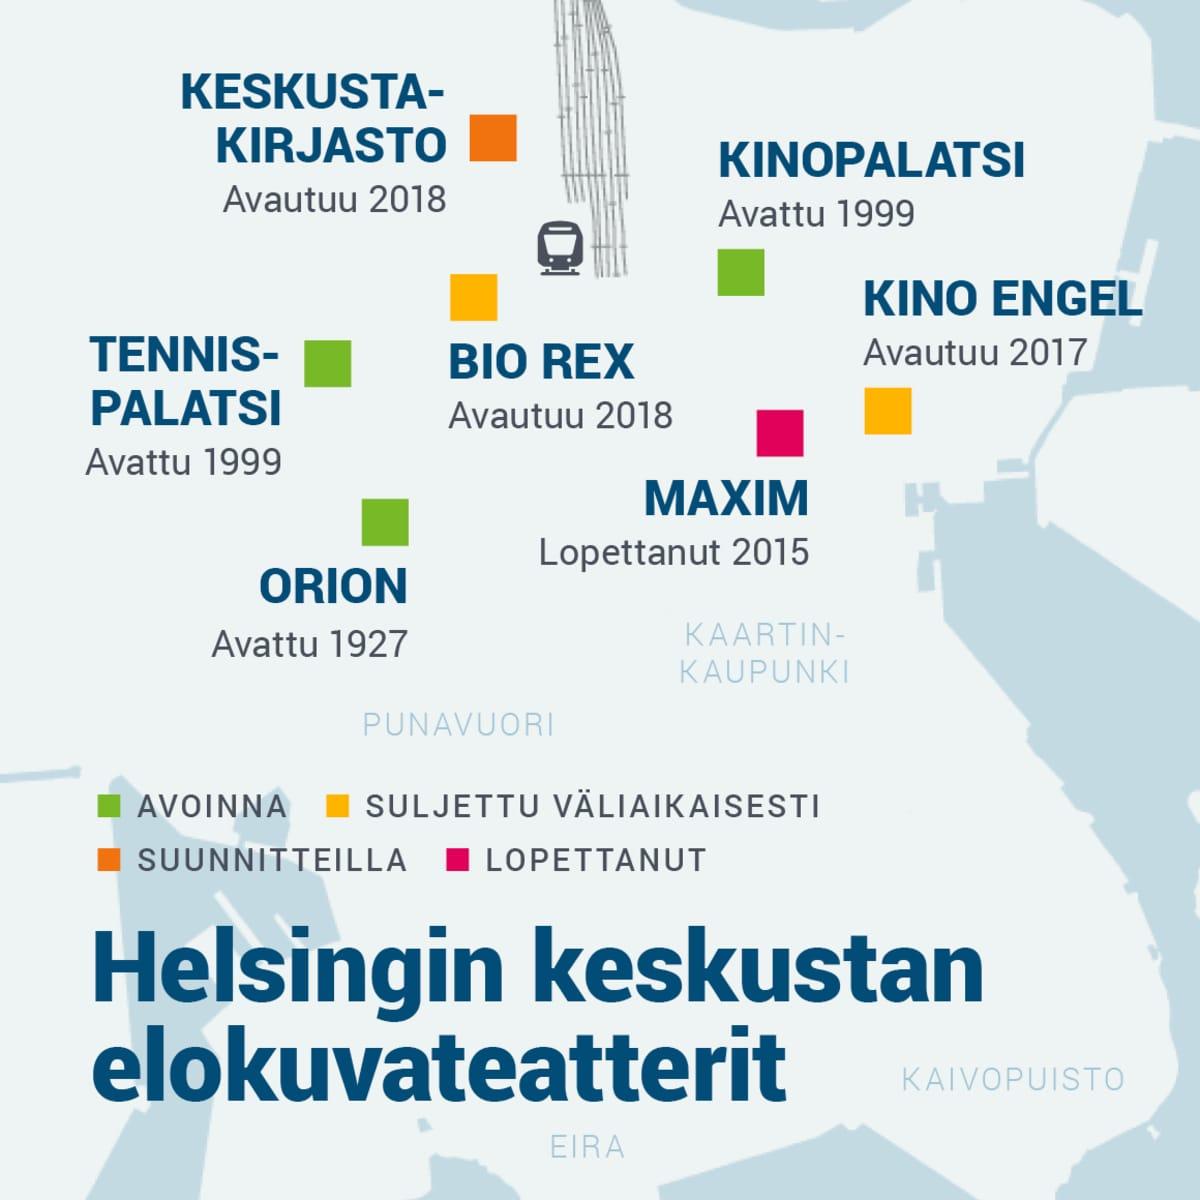 Helsingin keskustan elokuvateatterit.